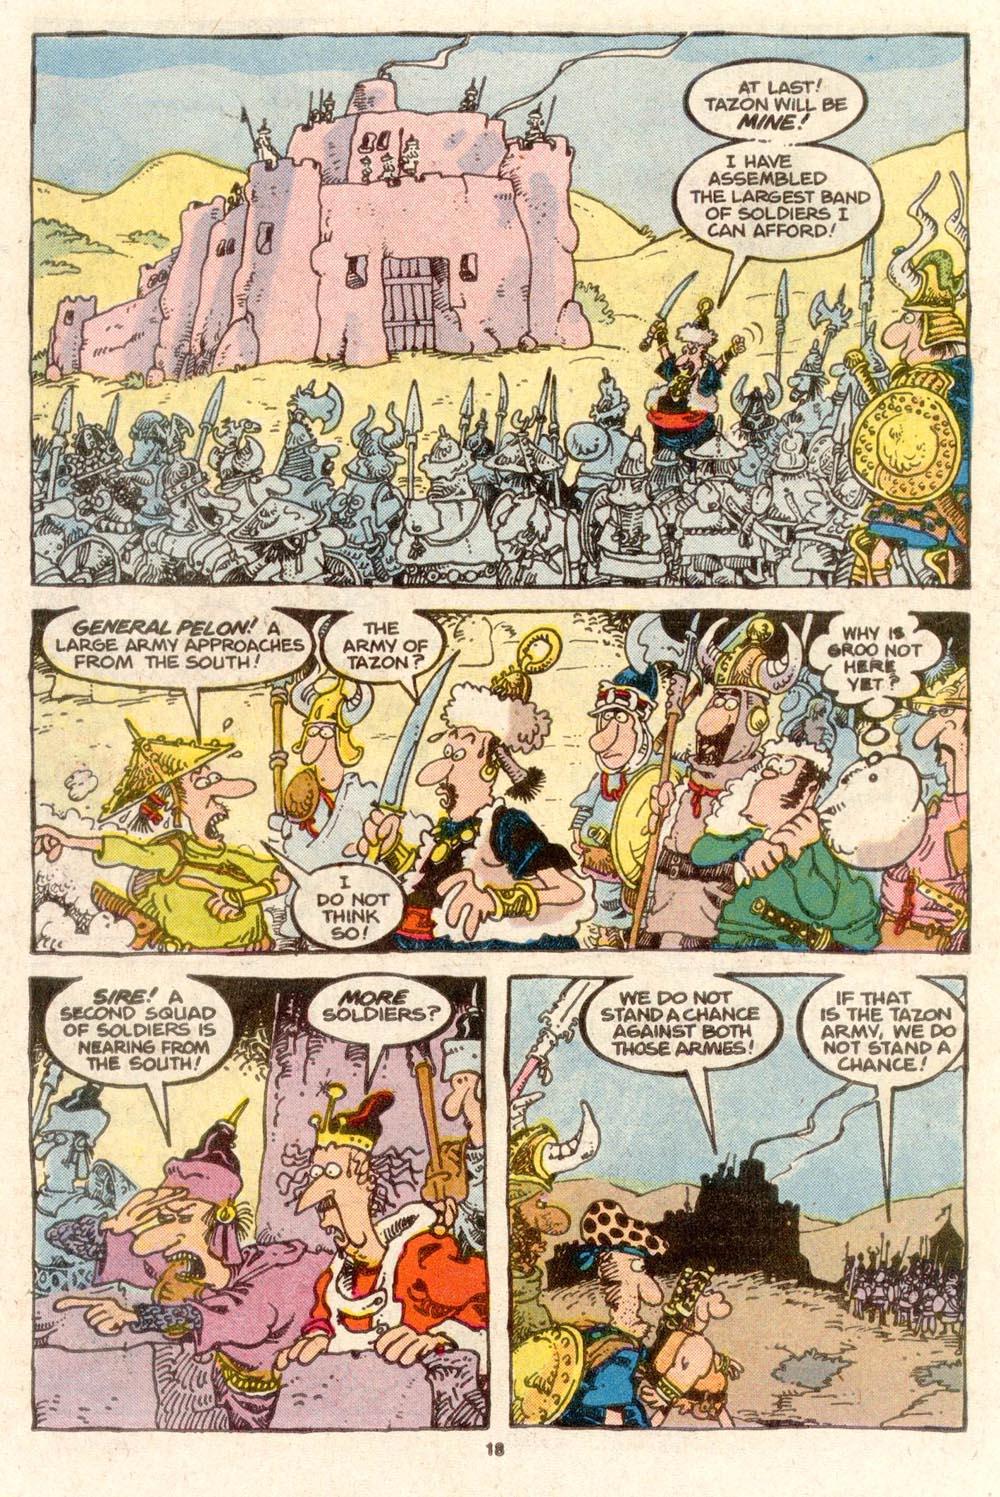 Read online Sergio Aragonés Groo the Wanderer comic -  Issue #38 - 18